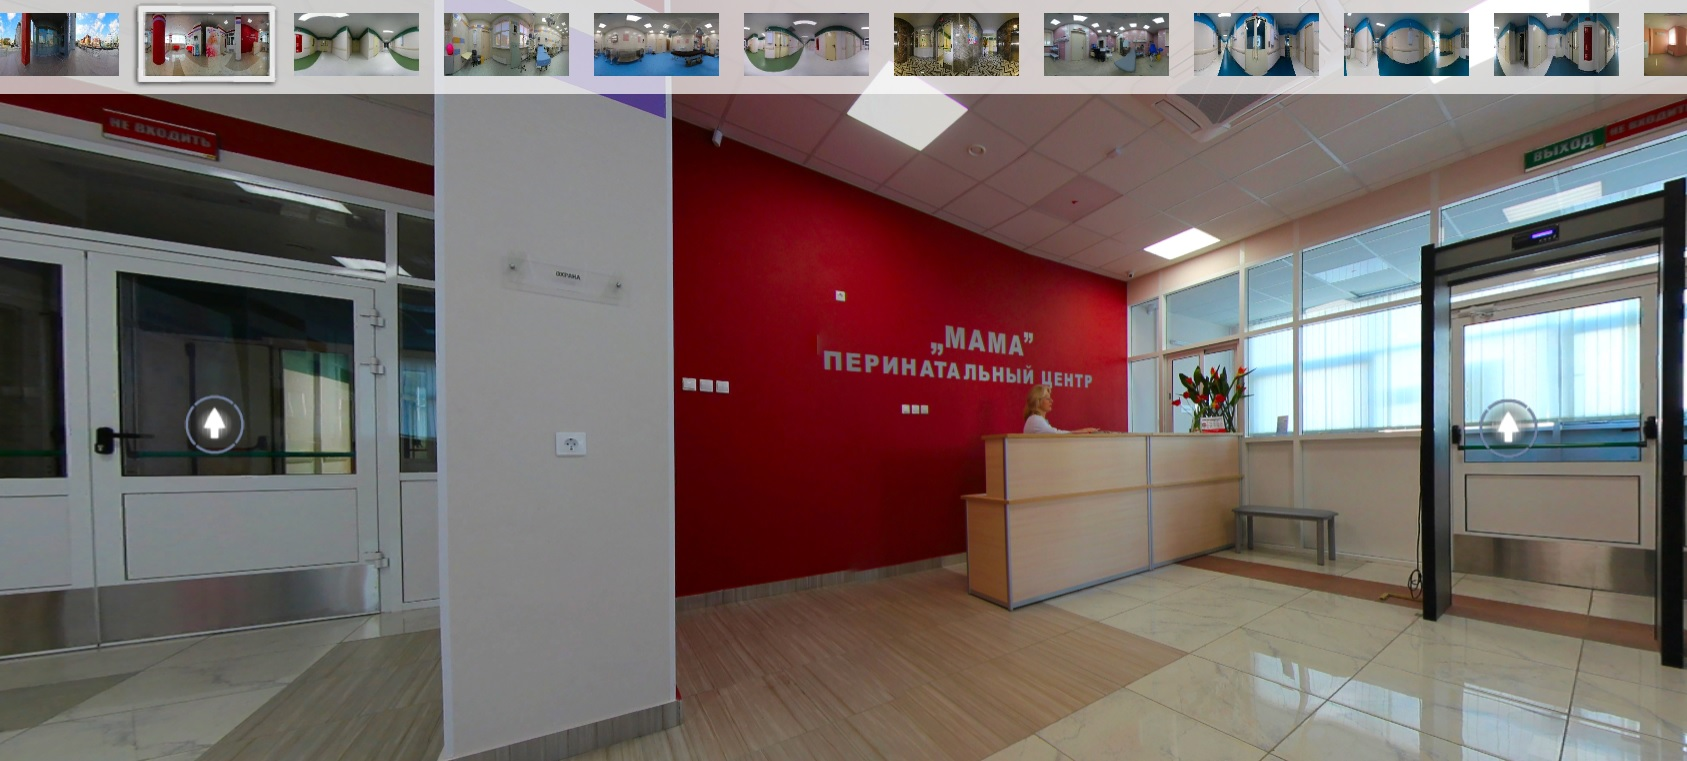 Центр МАМА_3dтур